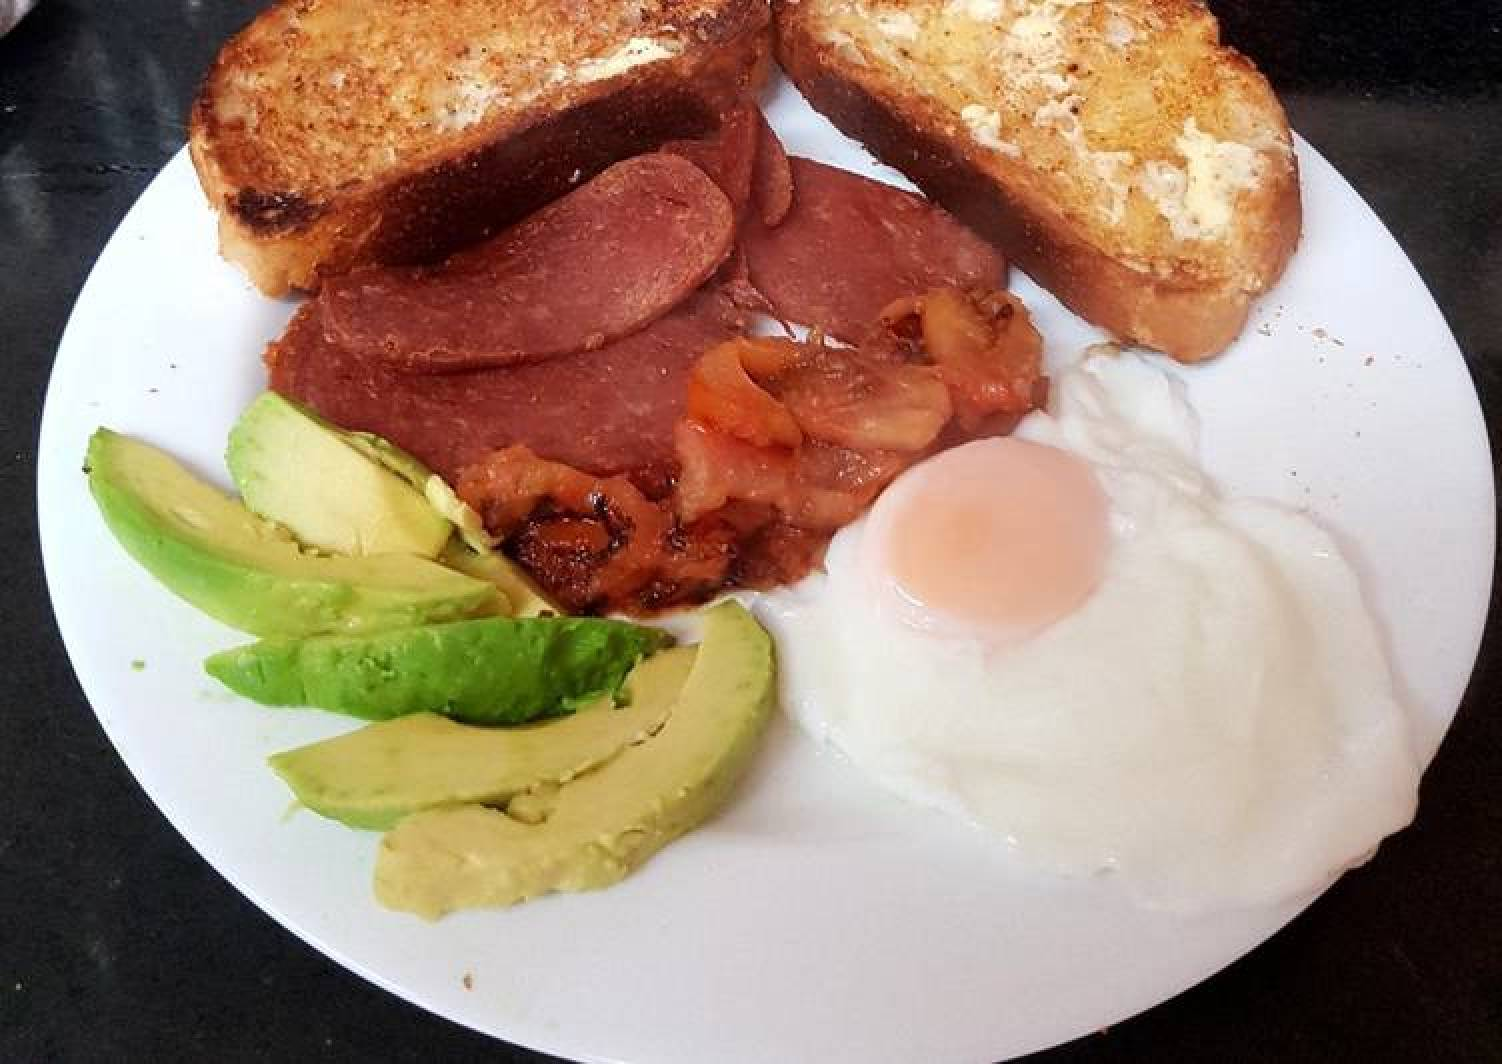 My Bacon Grill & Avocado Breakfast.😍